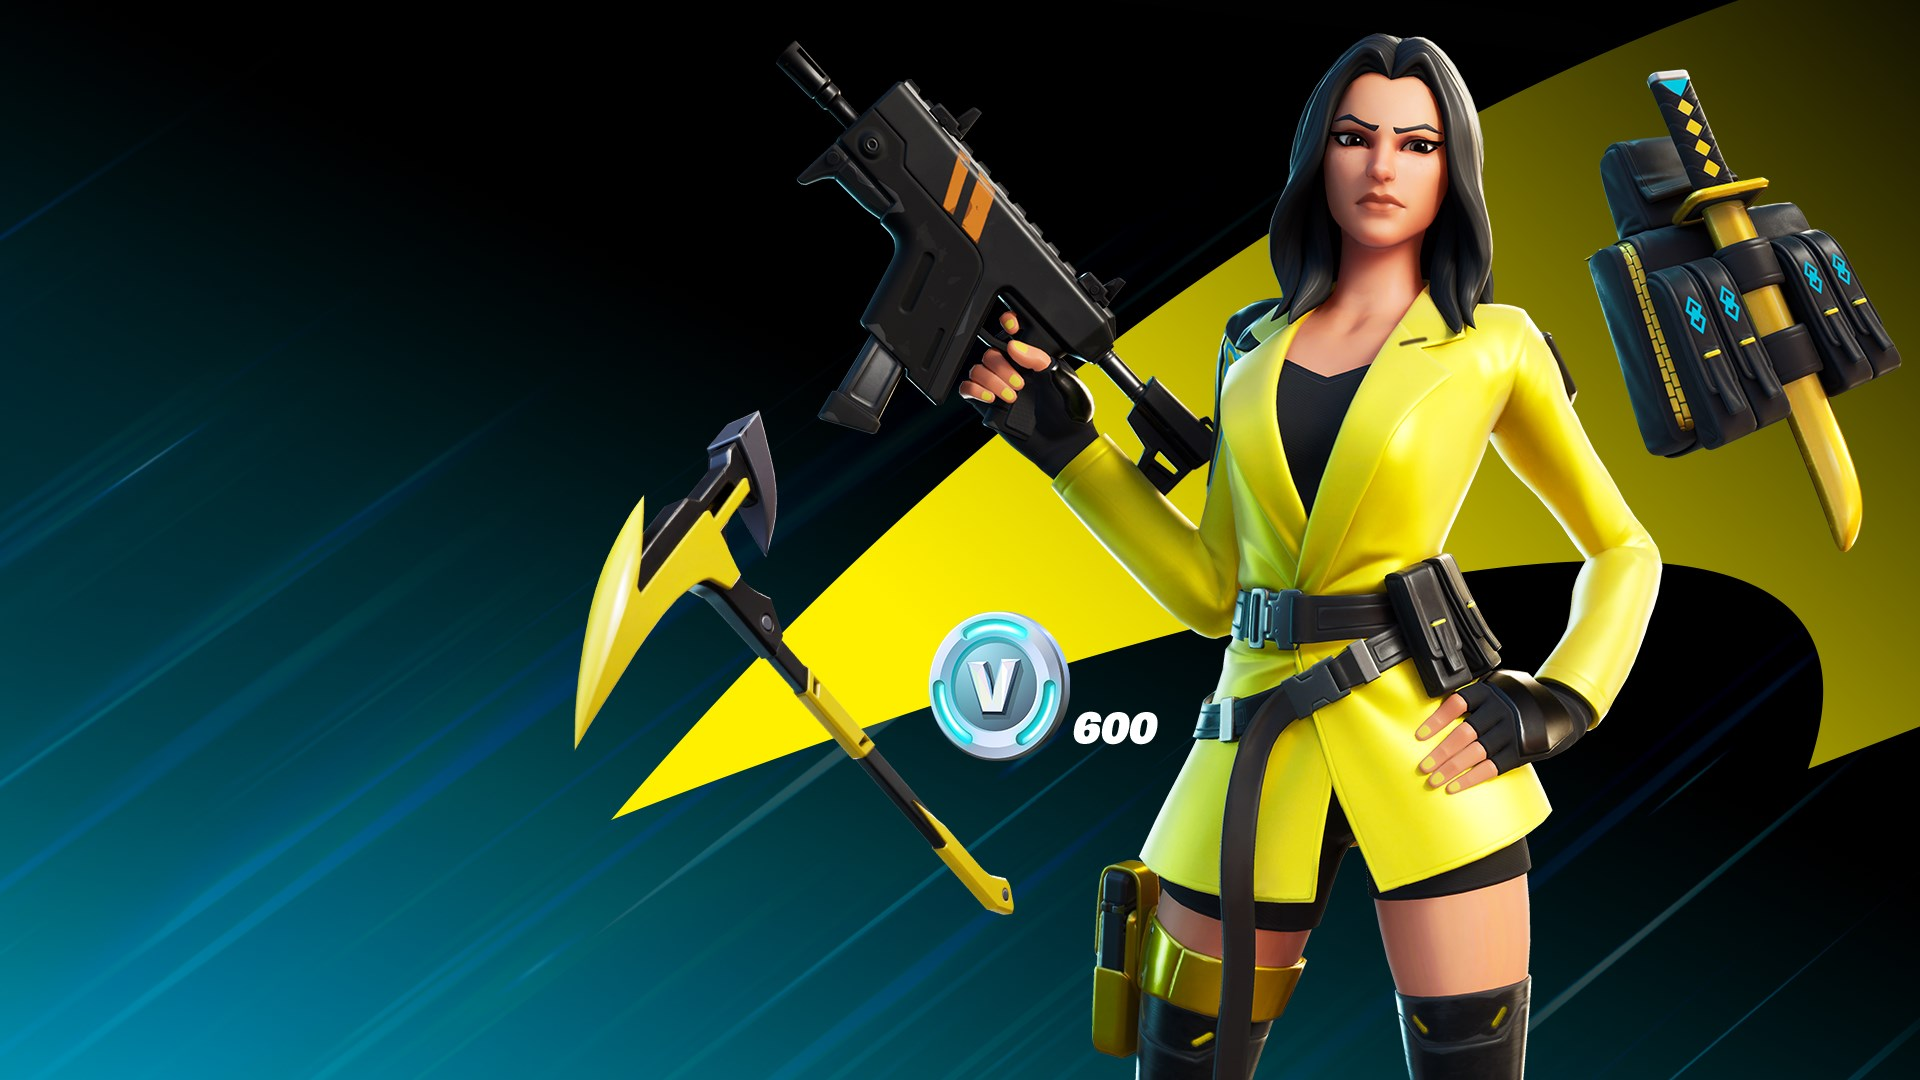 Buy Fortnite   The Yellowjacket Pack   Microsoft Store en CA 1920x1080